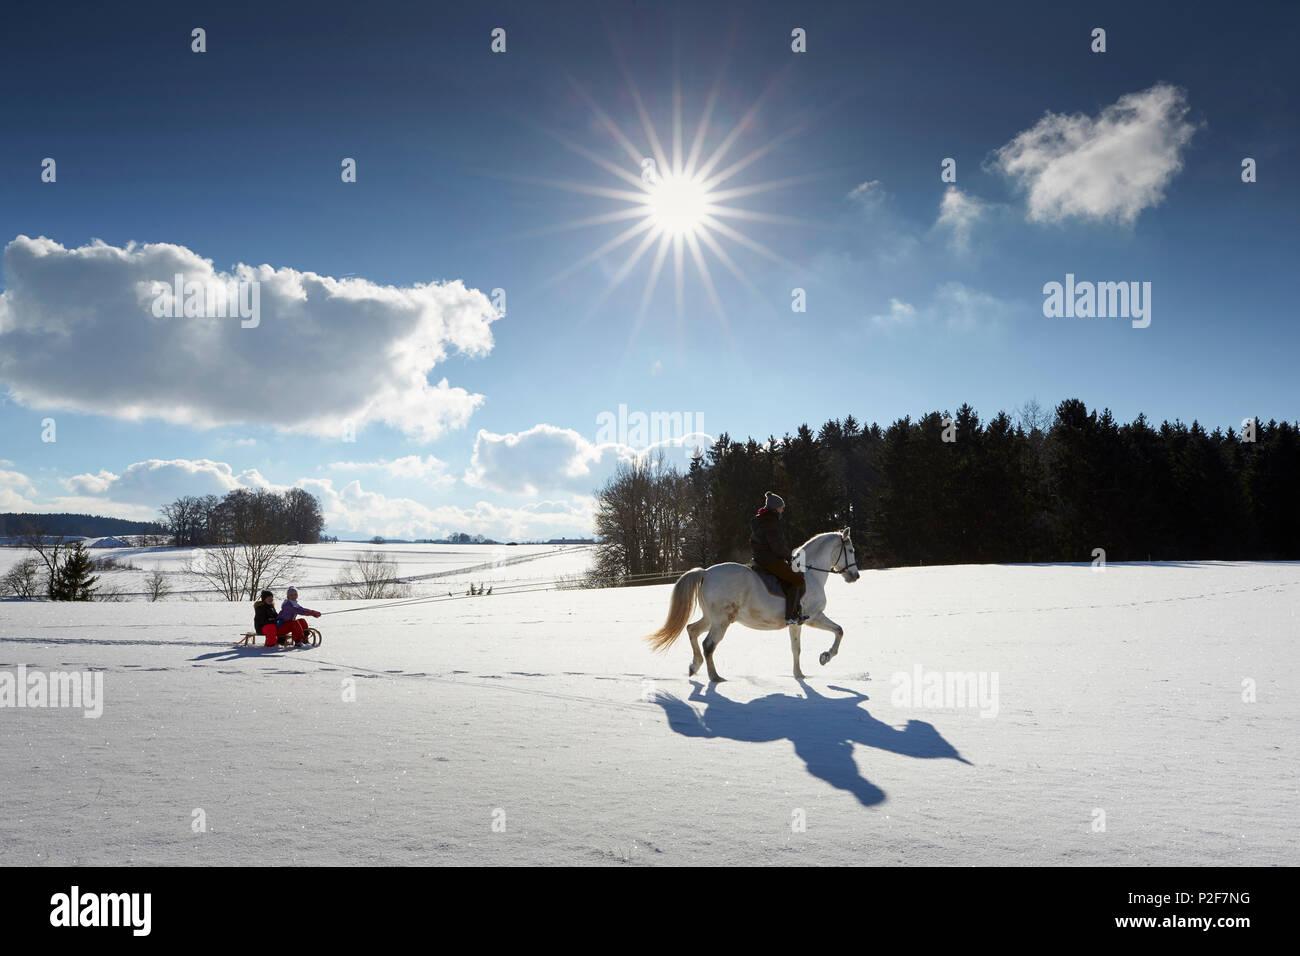 Madre a caballo tirando niños en trineo, Muensing Buchensee, Baviera, Alemania Imagen De Stock